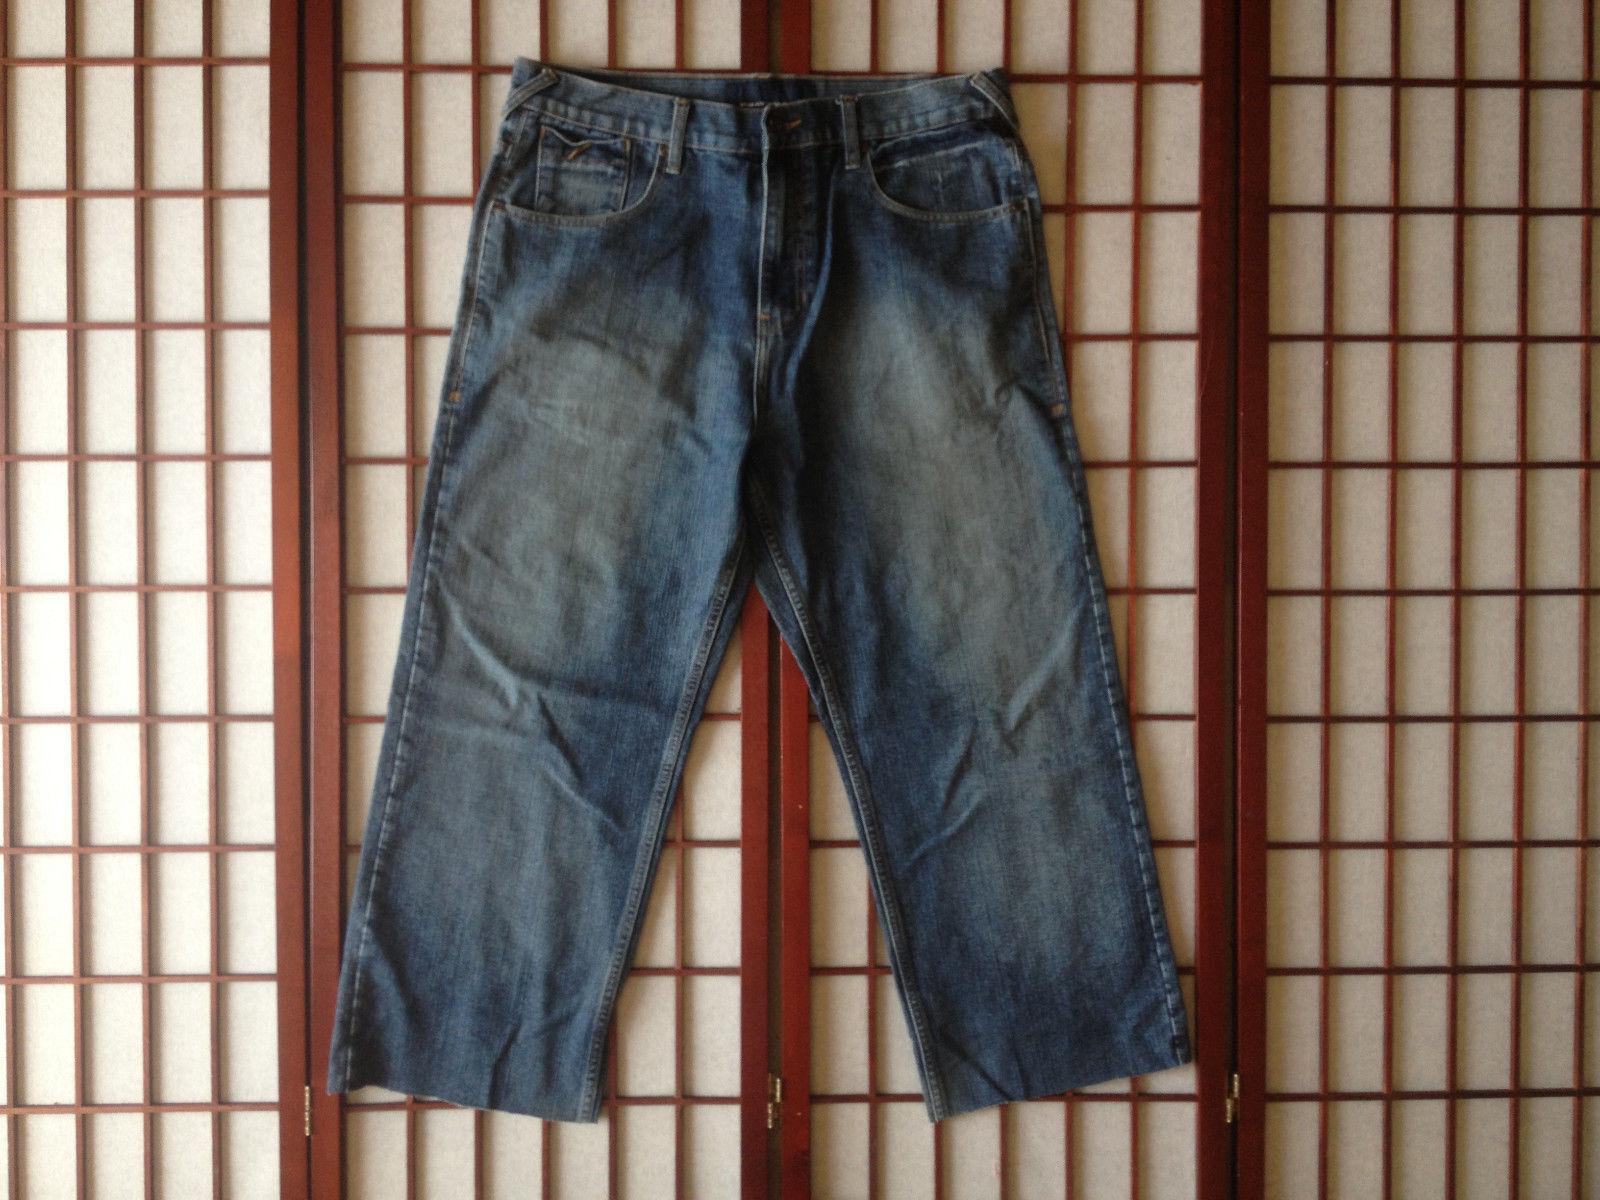 Phat Farm Relaxed Fit Classic Jeans Mens Apparel Sze 39 Ins 26 Cotton Garment